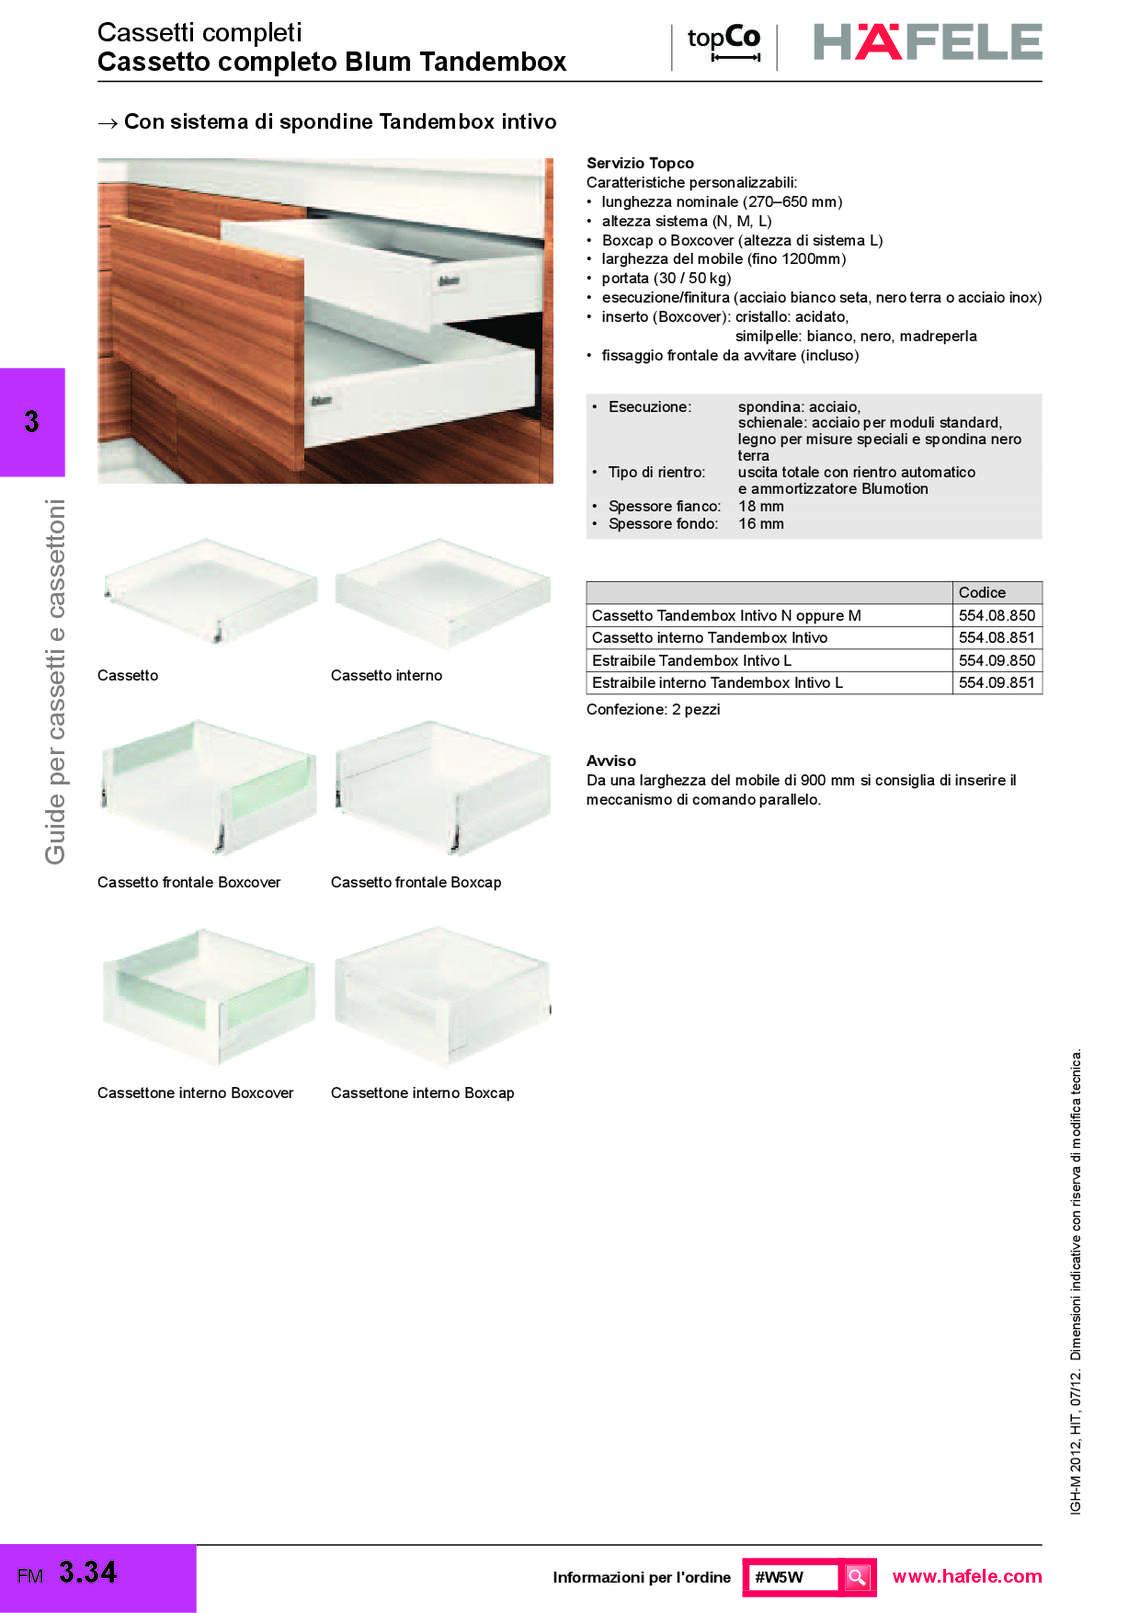 hafele-prodotti-su-misura_81_047.jpg